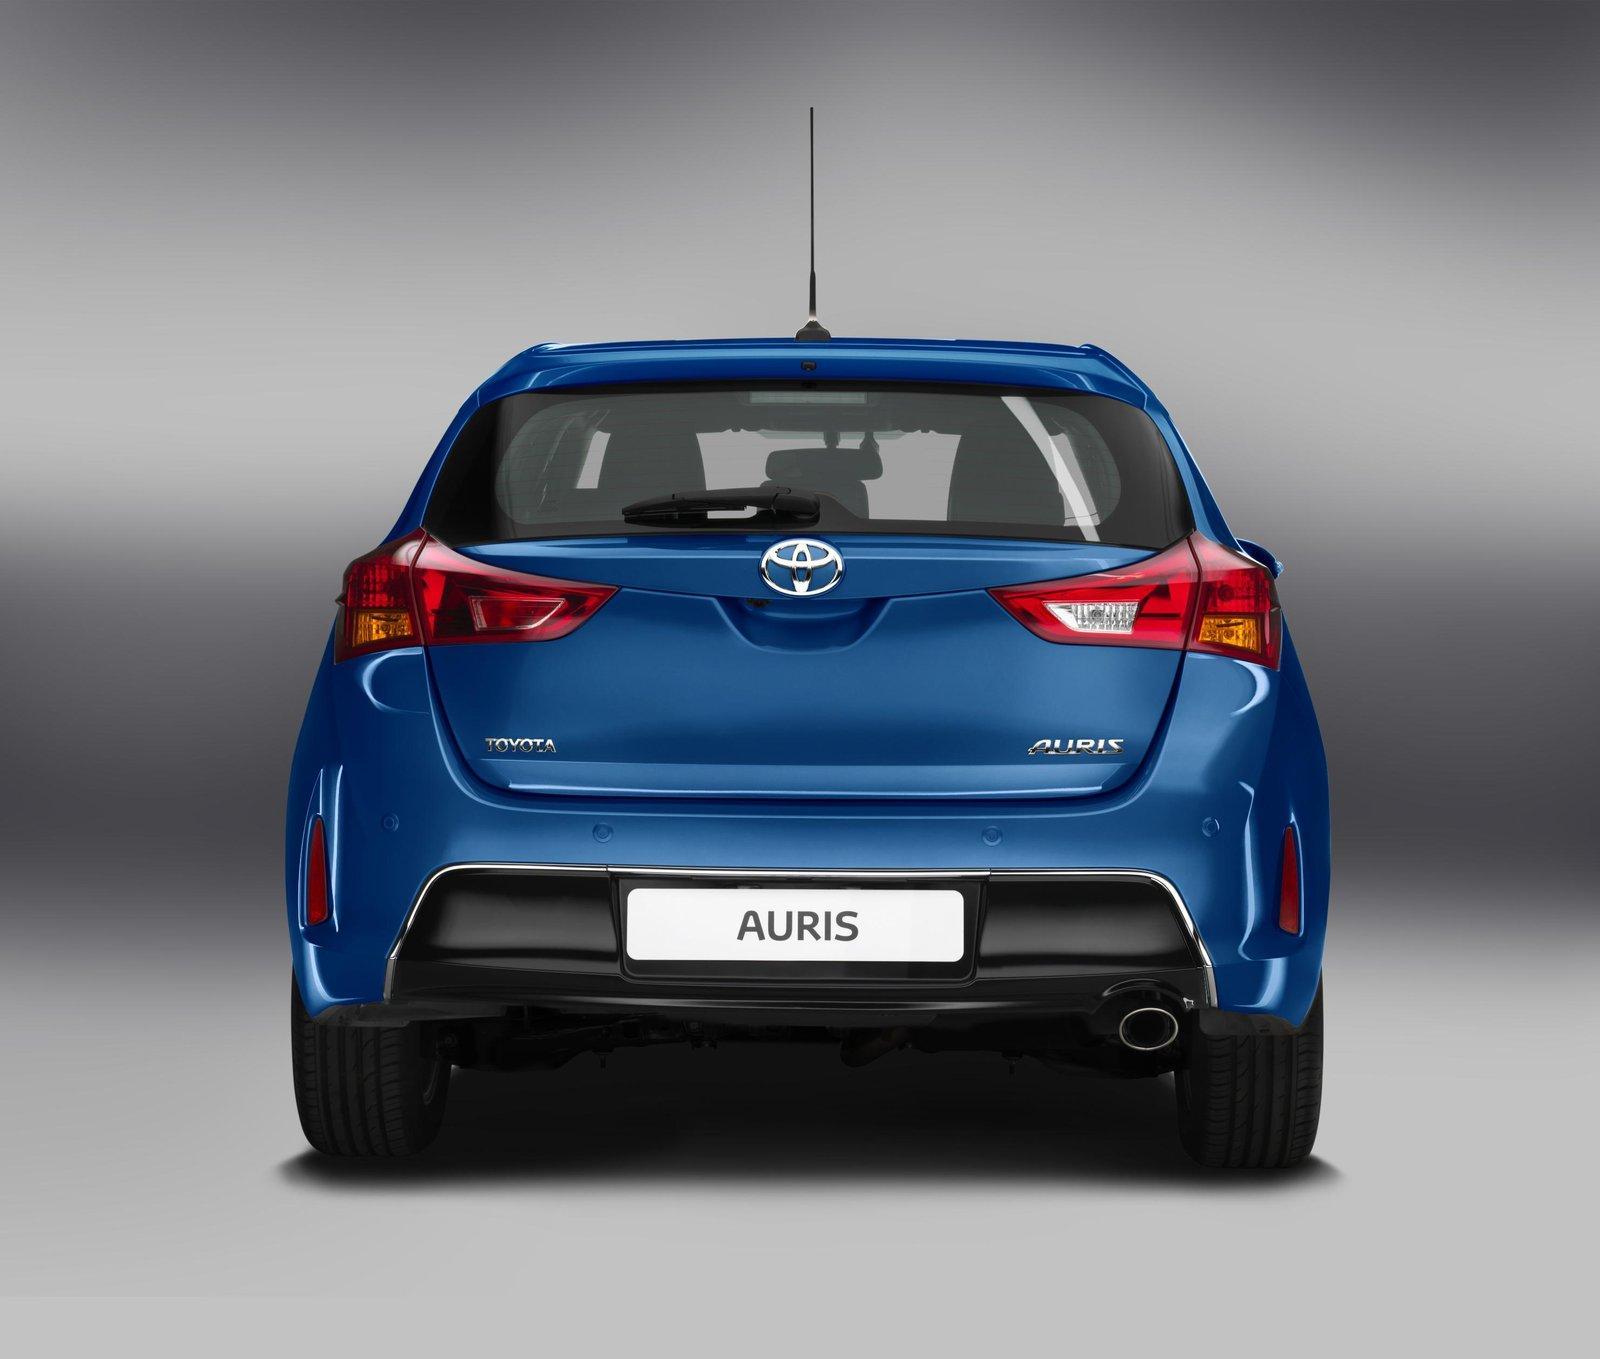 ... 2013 Toyota Auris, ...